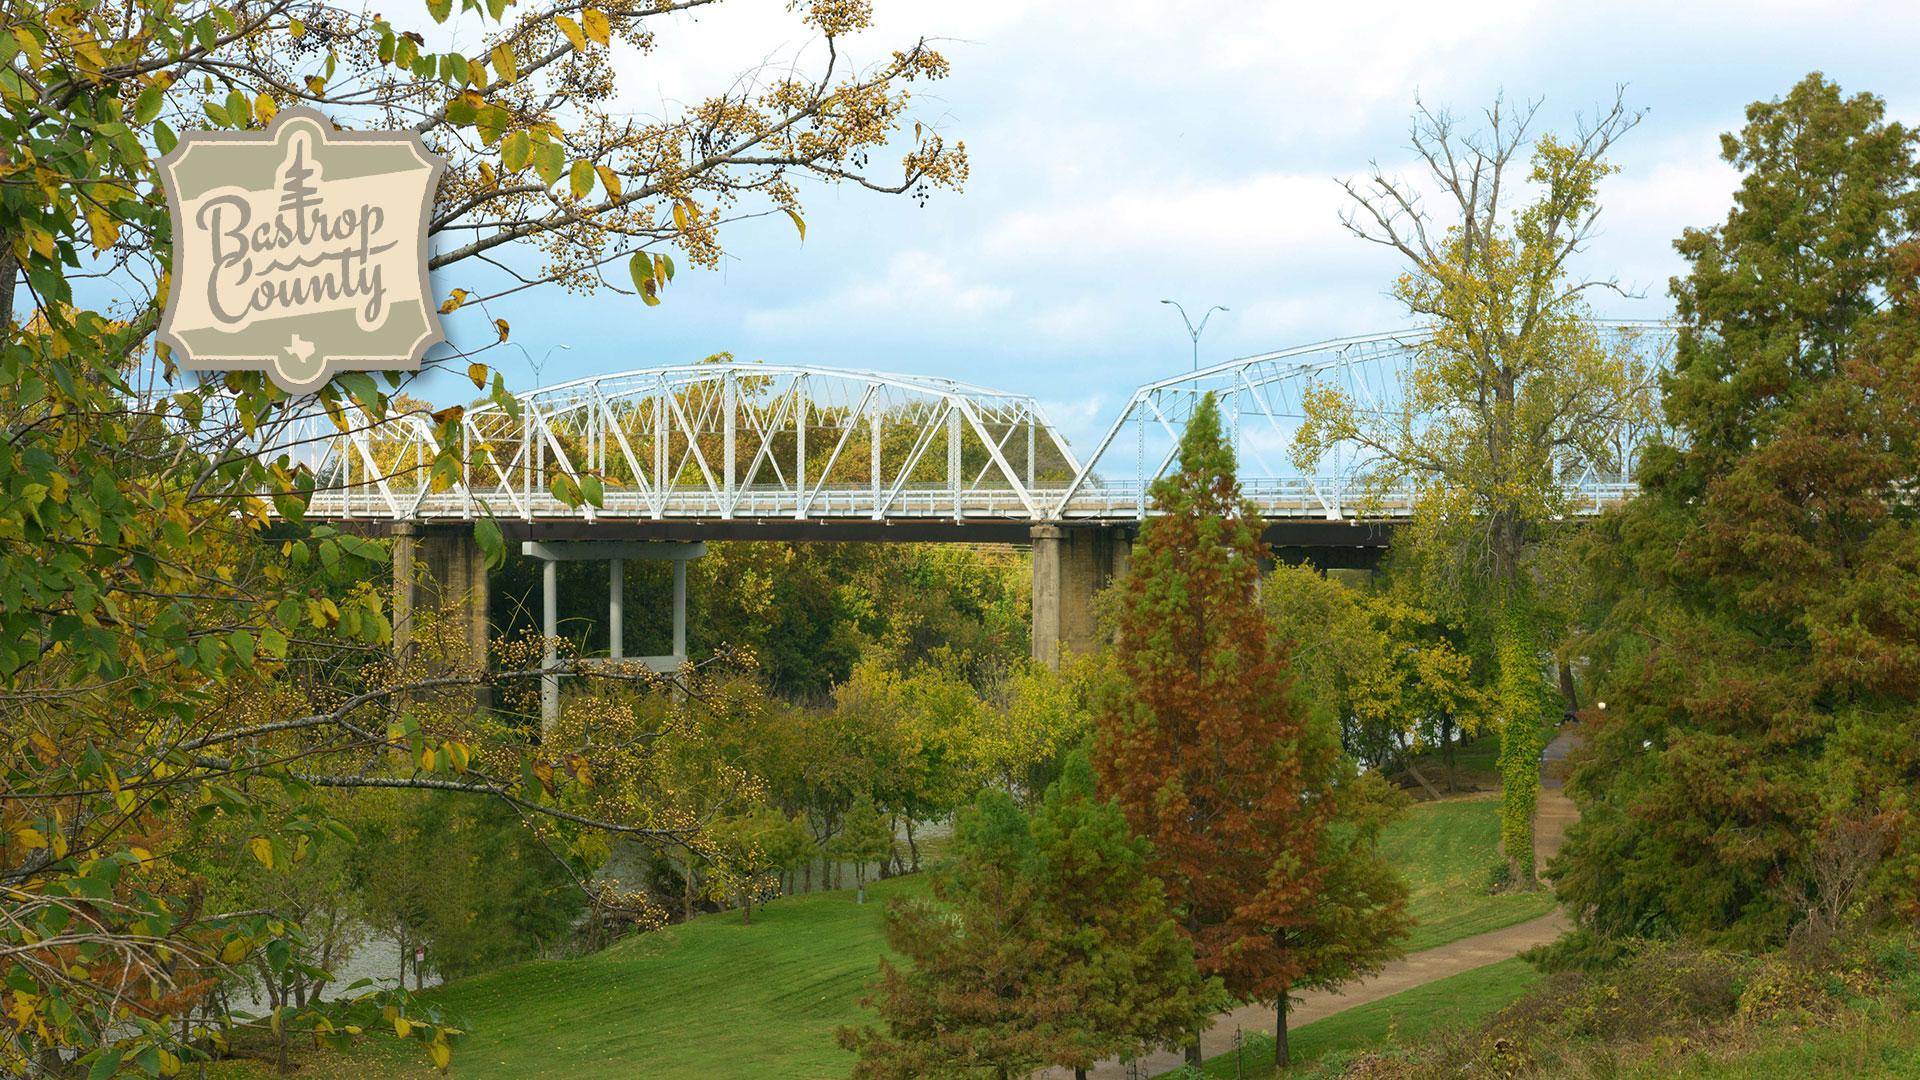 View of Bastrop Bridge from river banks